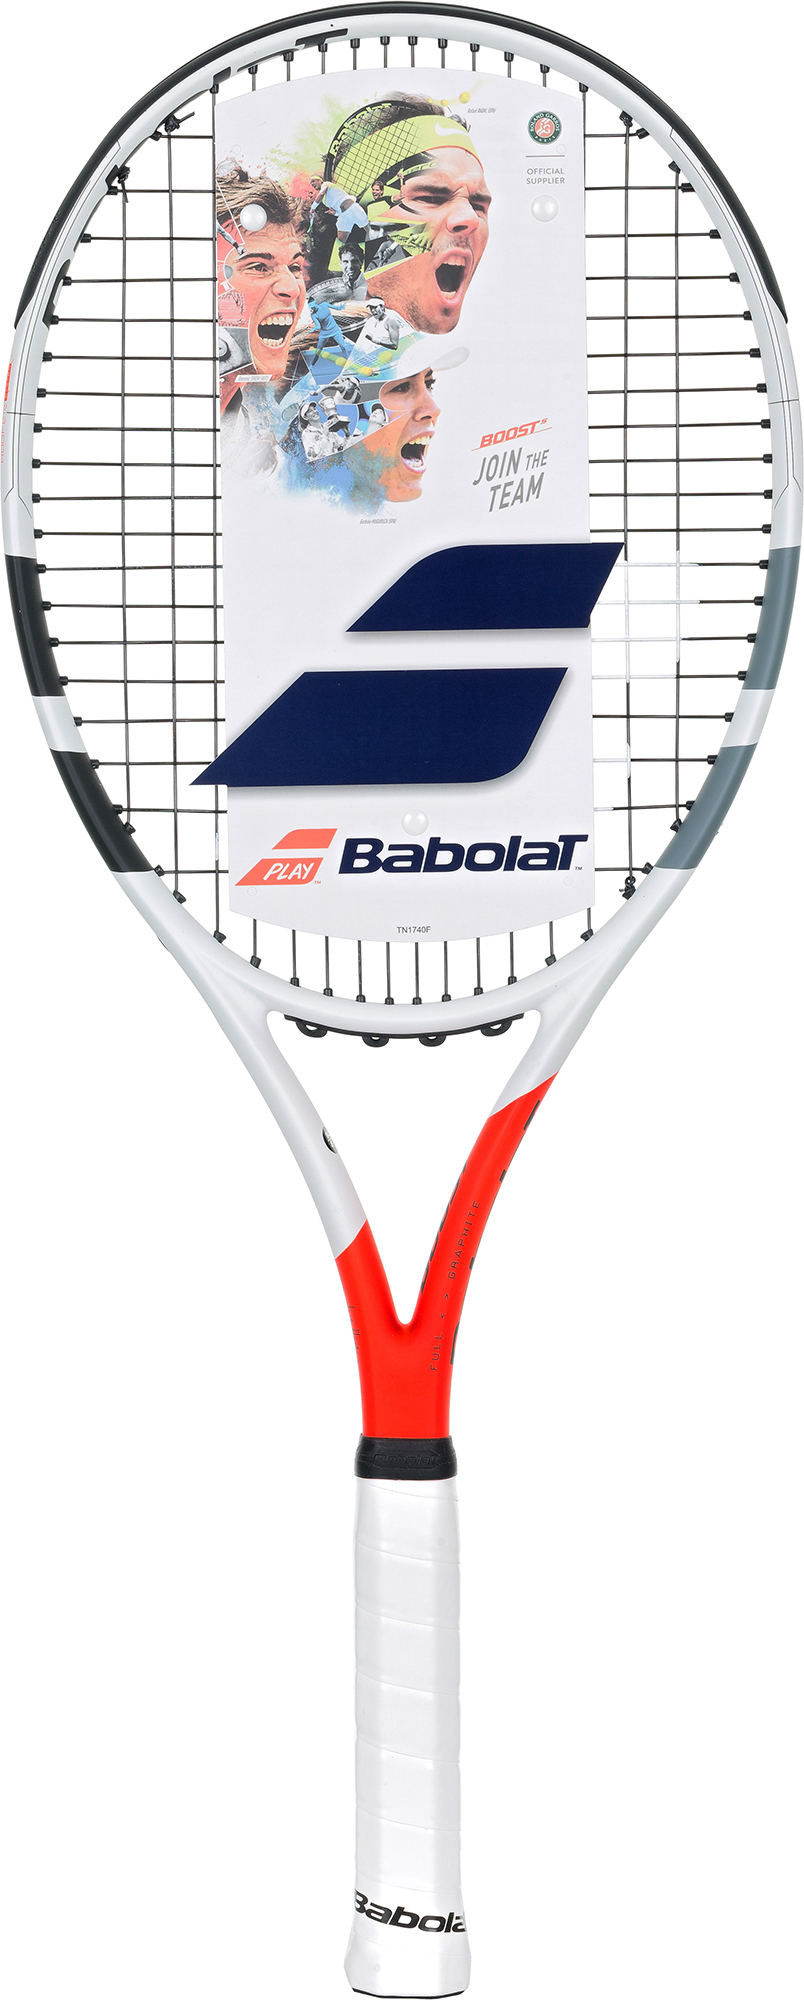 Babolat Ракетка для большого тенниса Babolat Boost Strike сетки для тенниса большого